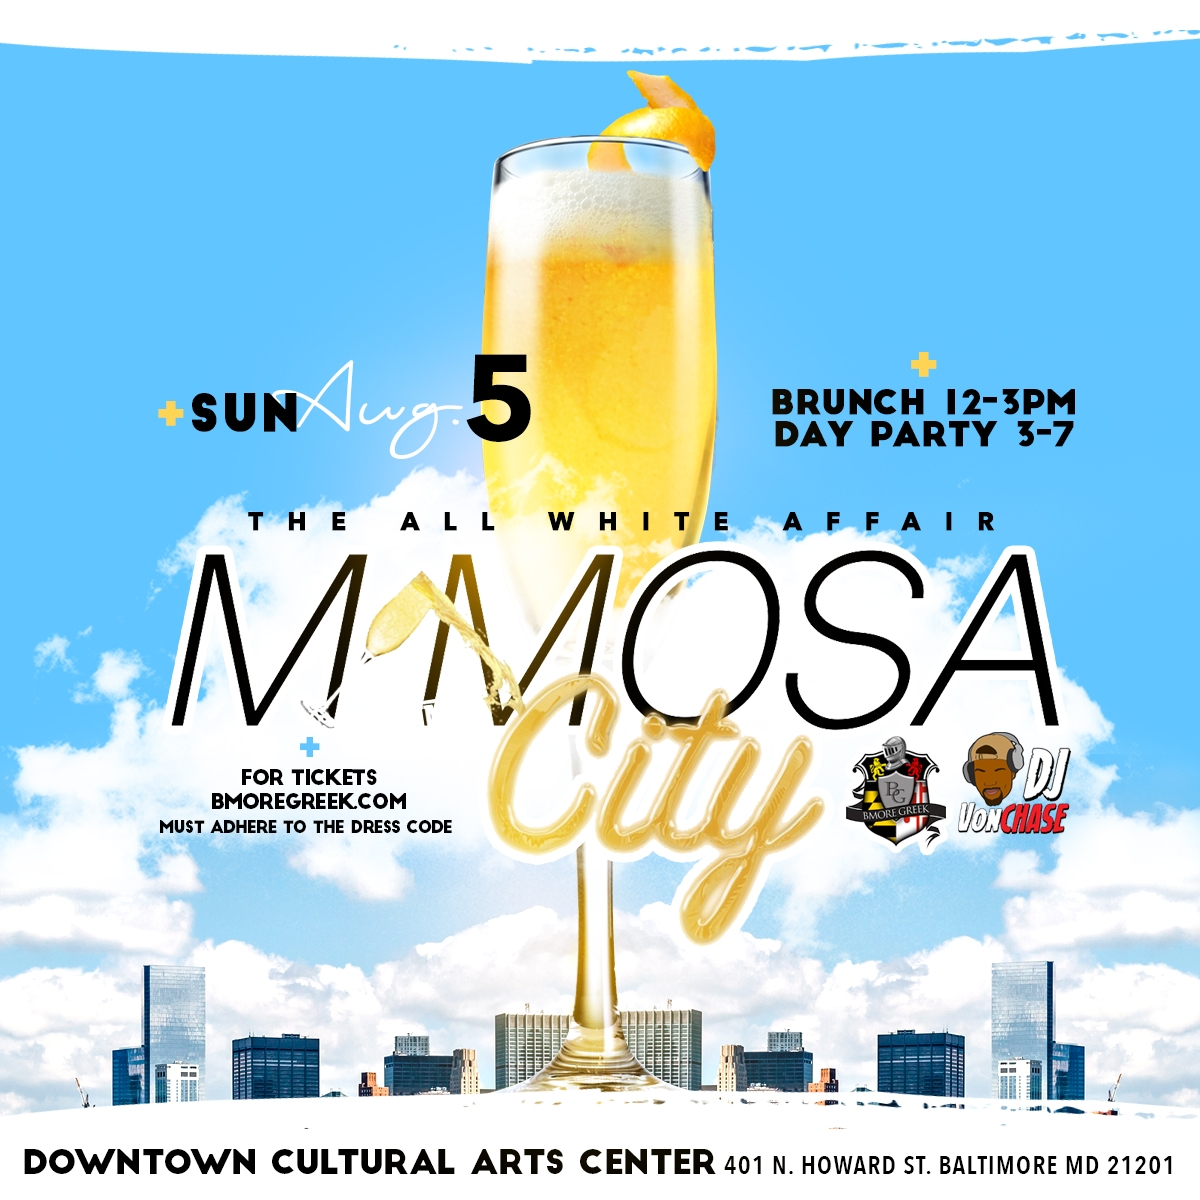 Sunday BmoreGreek Mimosa City